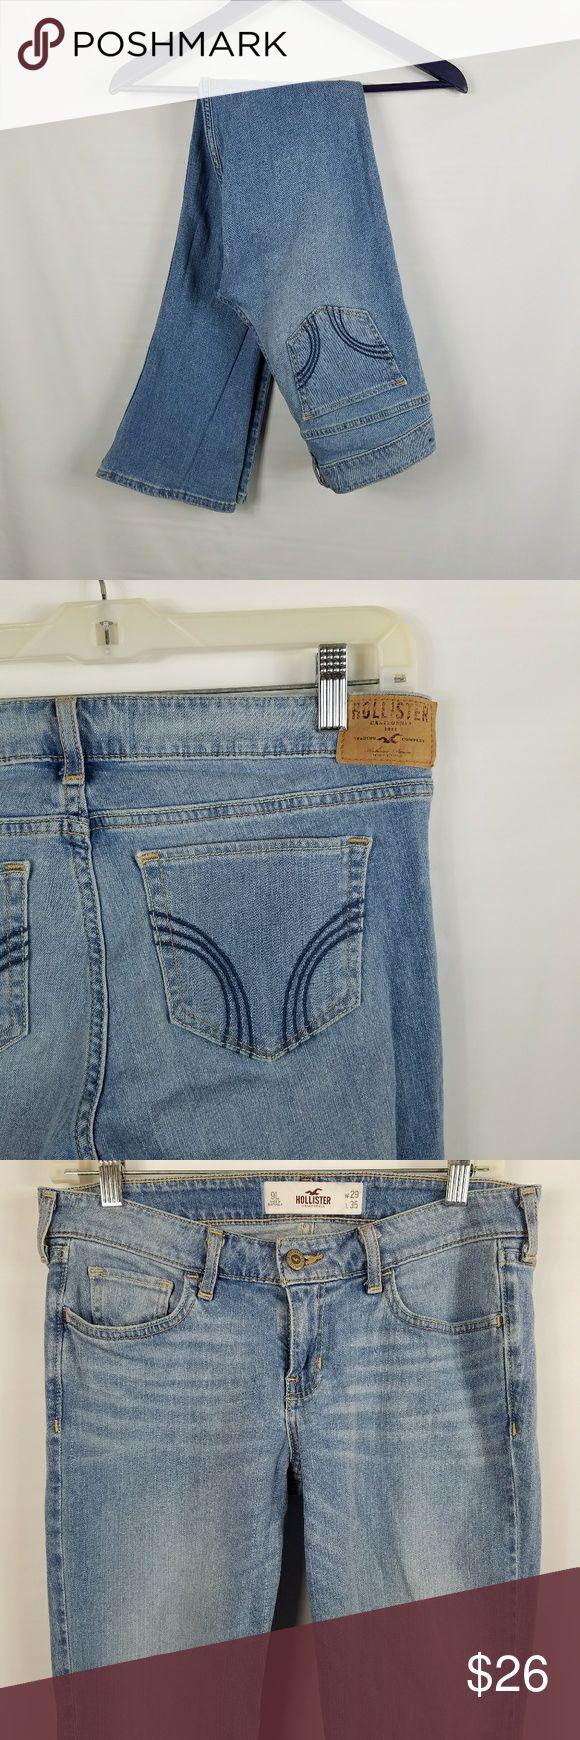 "Hollister boot cut light wash jeans size 9 long Excellent condition Hollister boot cut jeans in a light wash. Size 9 Measurements: Waist: 15"" Hips: 17.5"" Length: 41"" Inseam: 33.5"" Hollister Jeans Boot Cut"